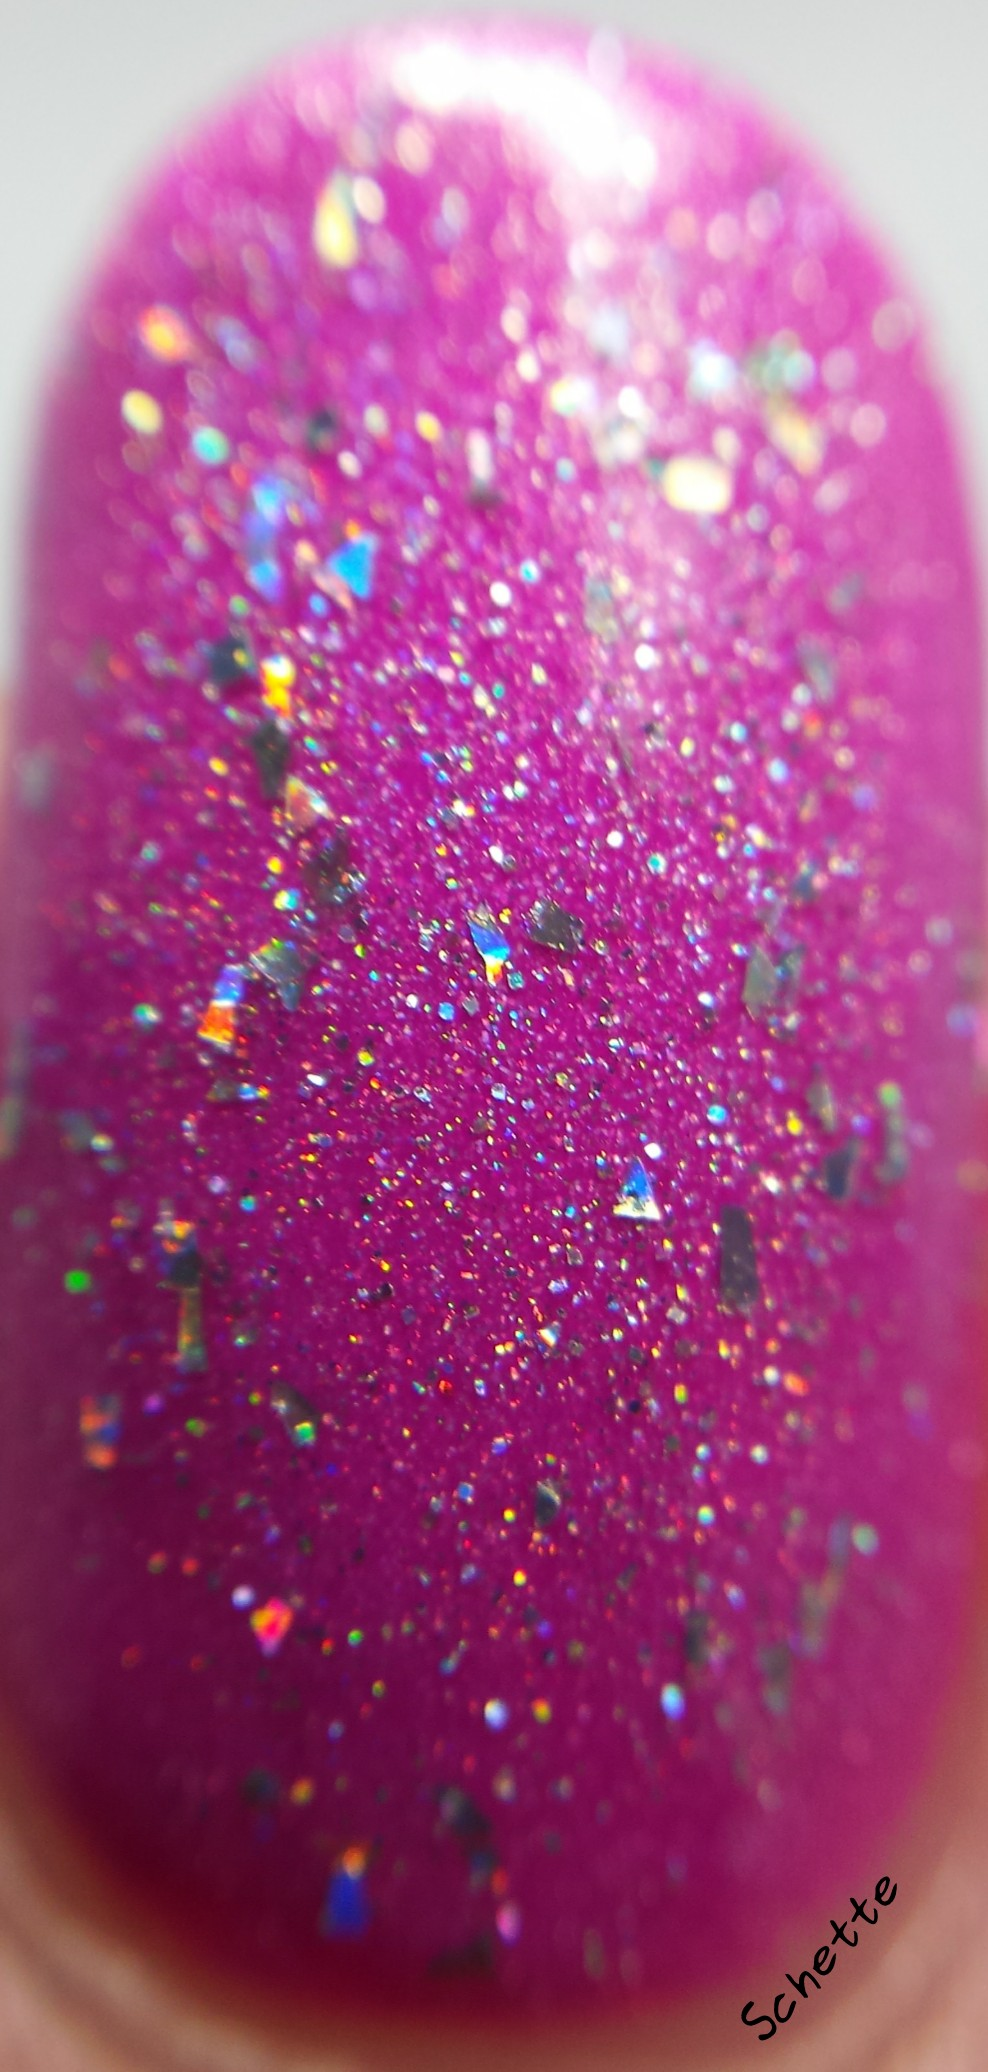 Enchanted Polish : Disco H20, Reign Beau, Dope Jam, Rainbow Juice (with pulp)